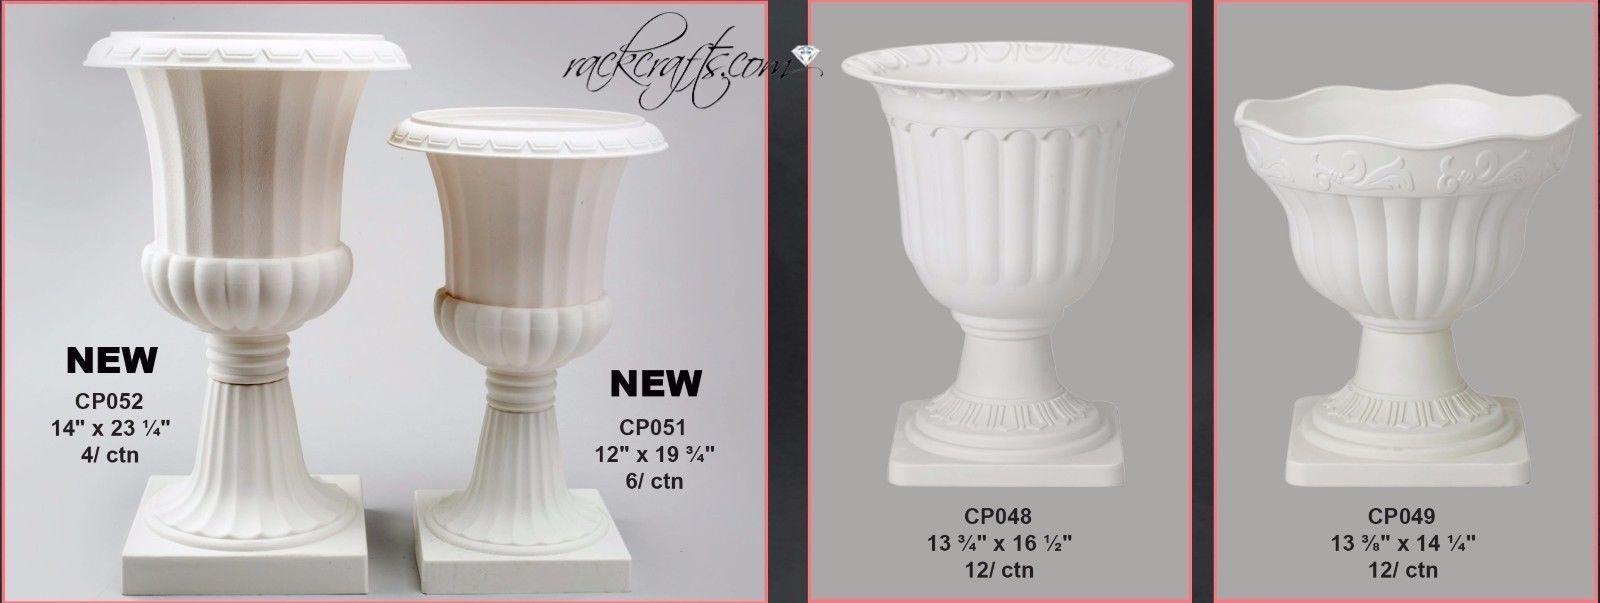 Large Rubber Plastic Roman Greek Planters Pots Urns Vases Plants Wedding Garden Plastic Vase Urn Vase Planter Pots